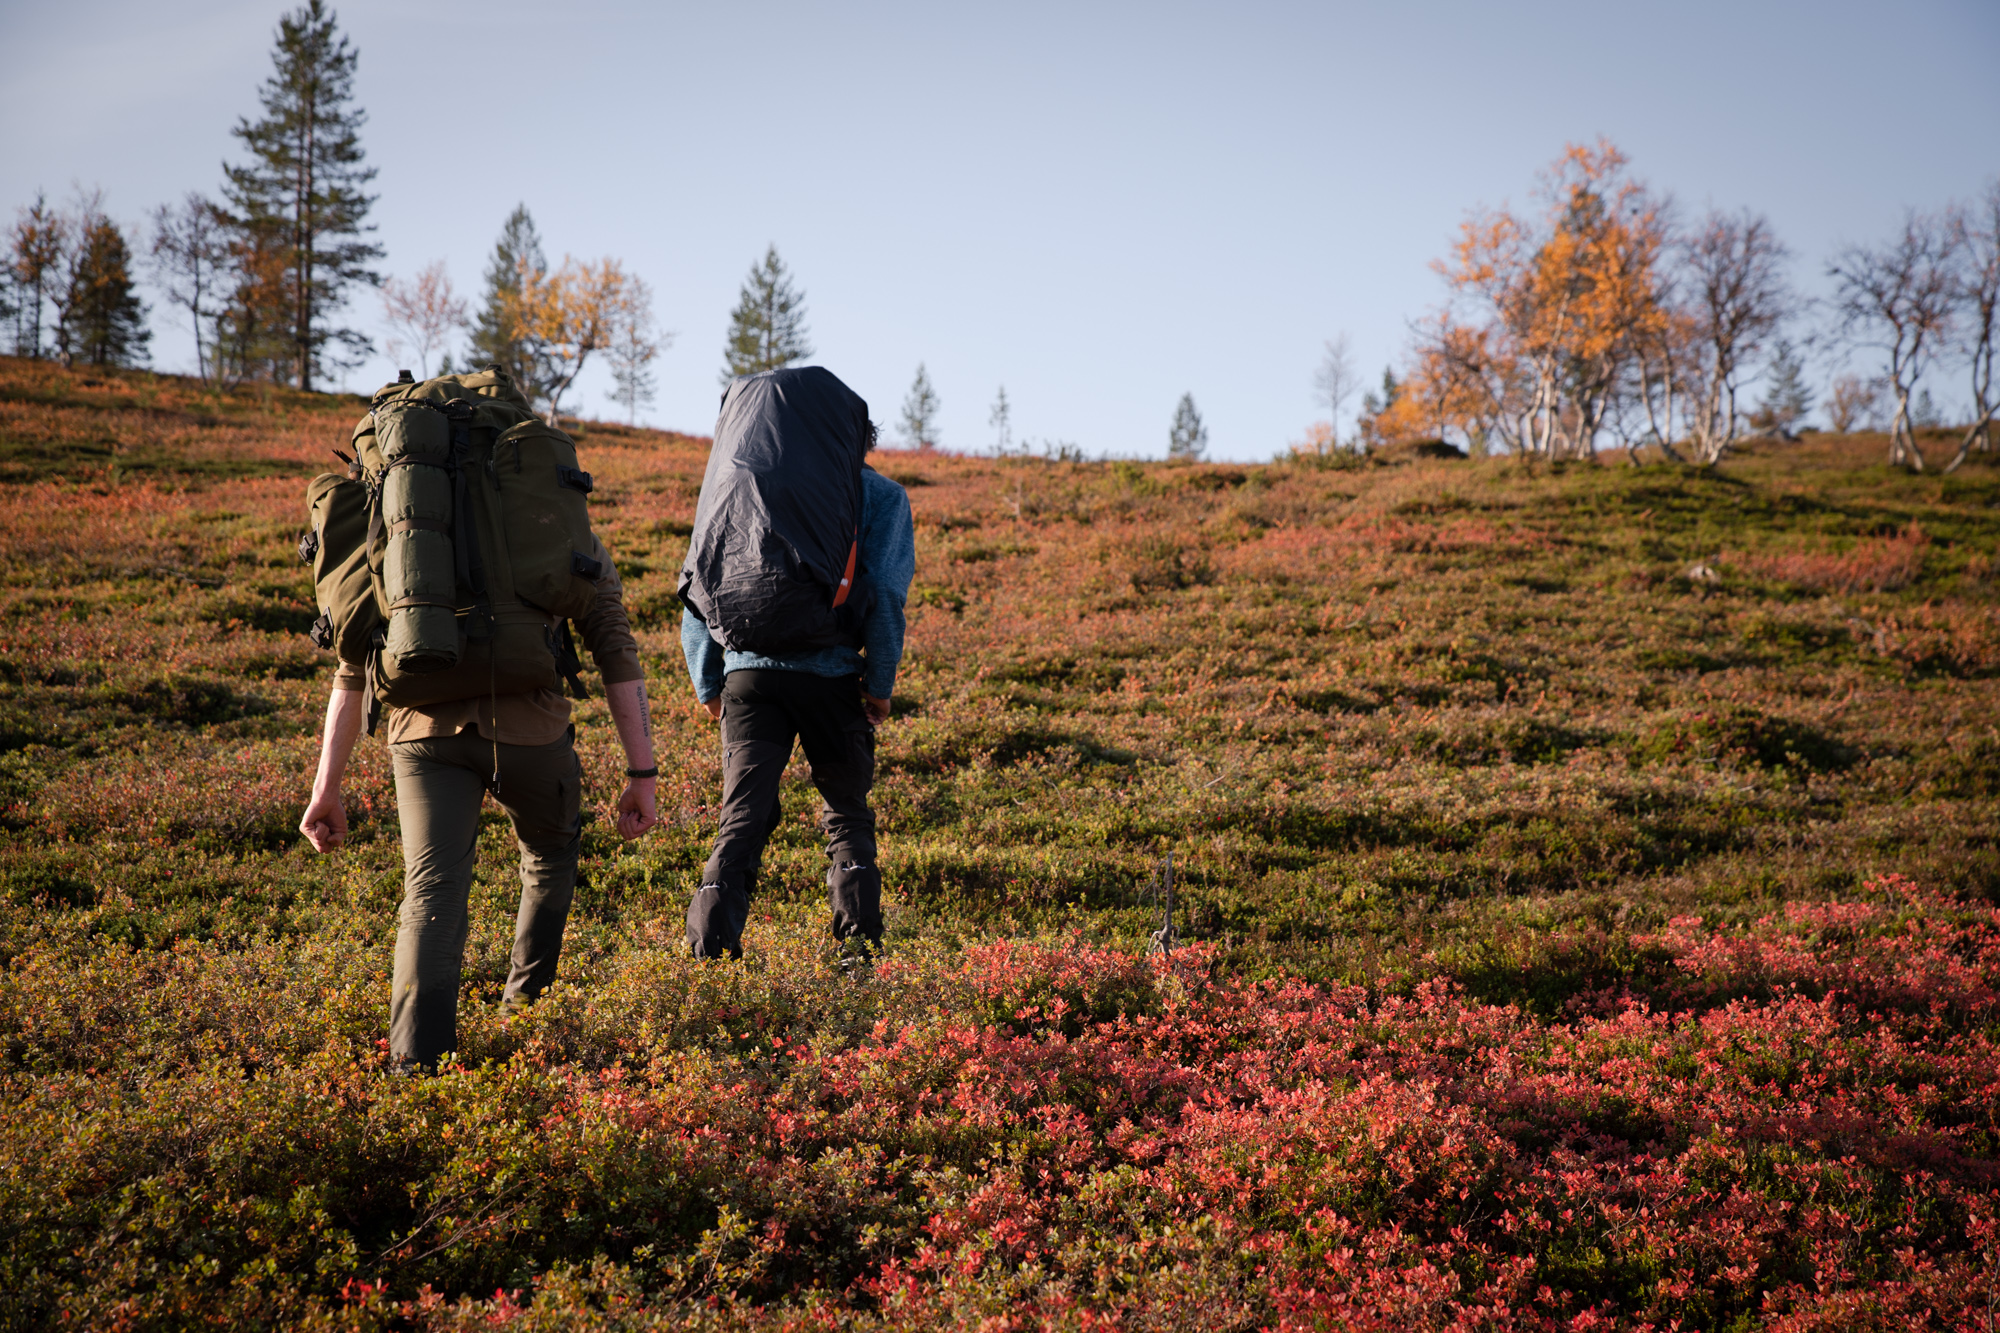 Deux randonneurs dans la zone sauvage de Hammastunturi en Laponie finlandaise